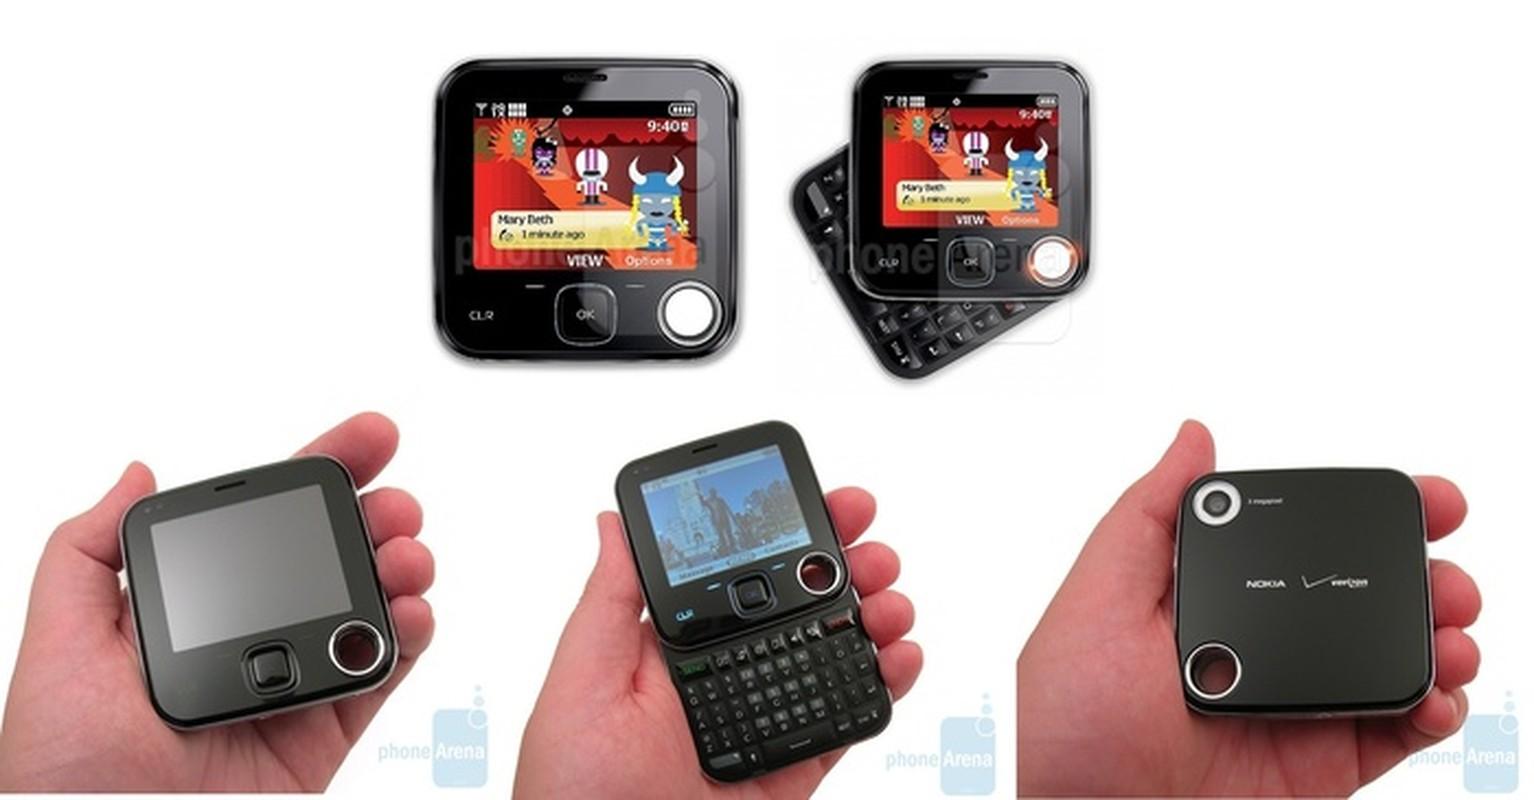 Nhung chiec dien thoai cua Nokia tung khuay dao thi truong-Hinh-6